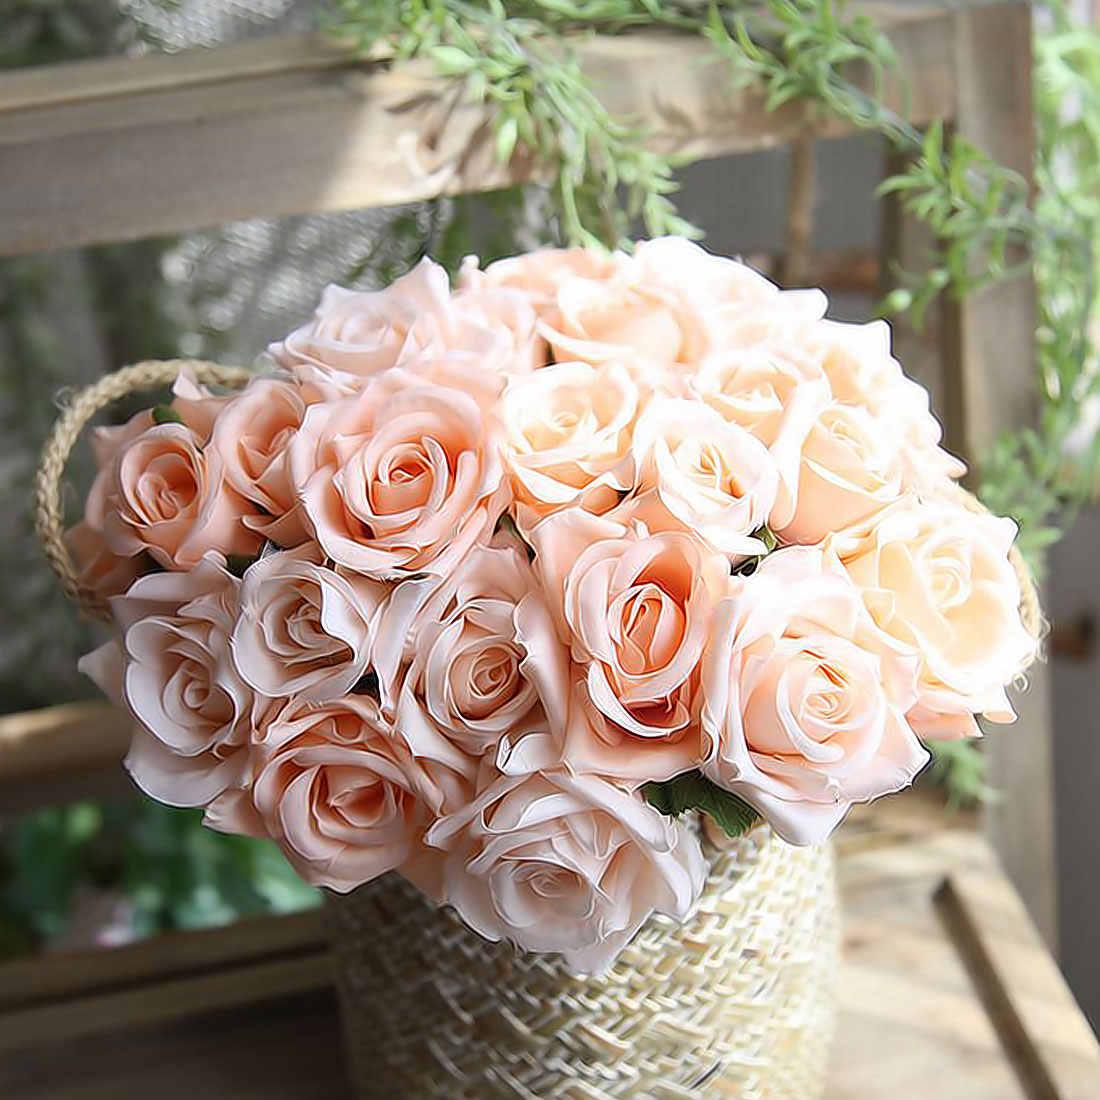 Stupendous Artificial Flowers Rose Bouquet For Wedding Decoration Fake Flowers Bedroom Home Party Decor Silk Hydrangeas Flower 9Pcs Set Download Free Architecture Designs Xaembritishbridgeorg